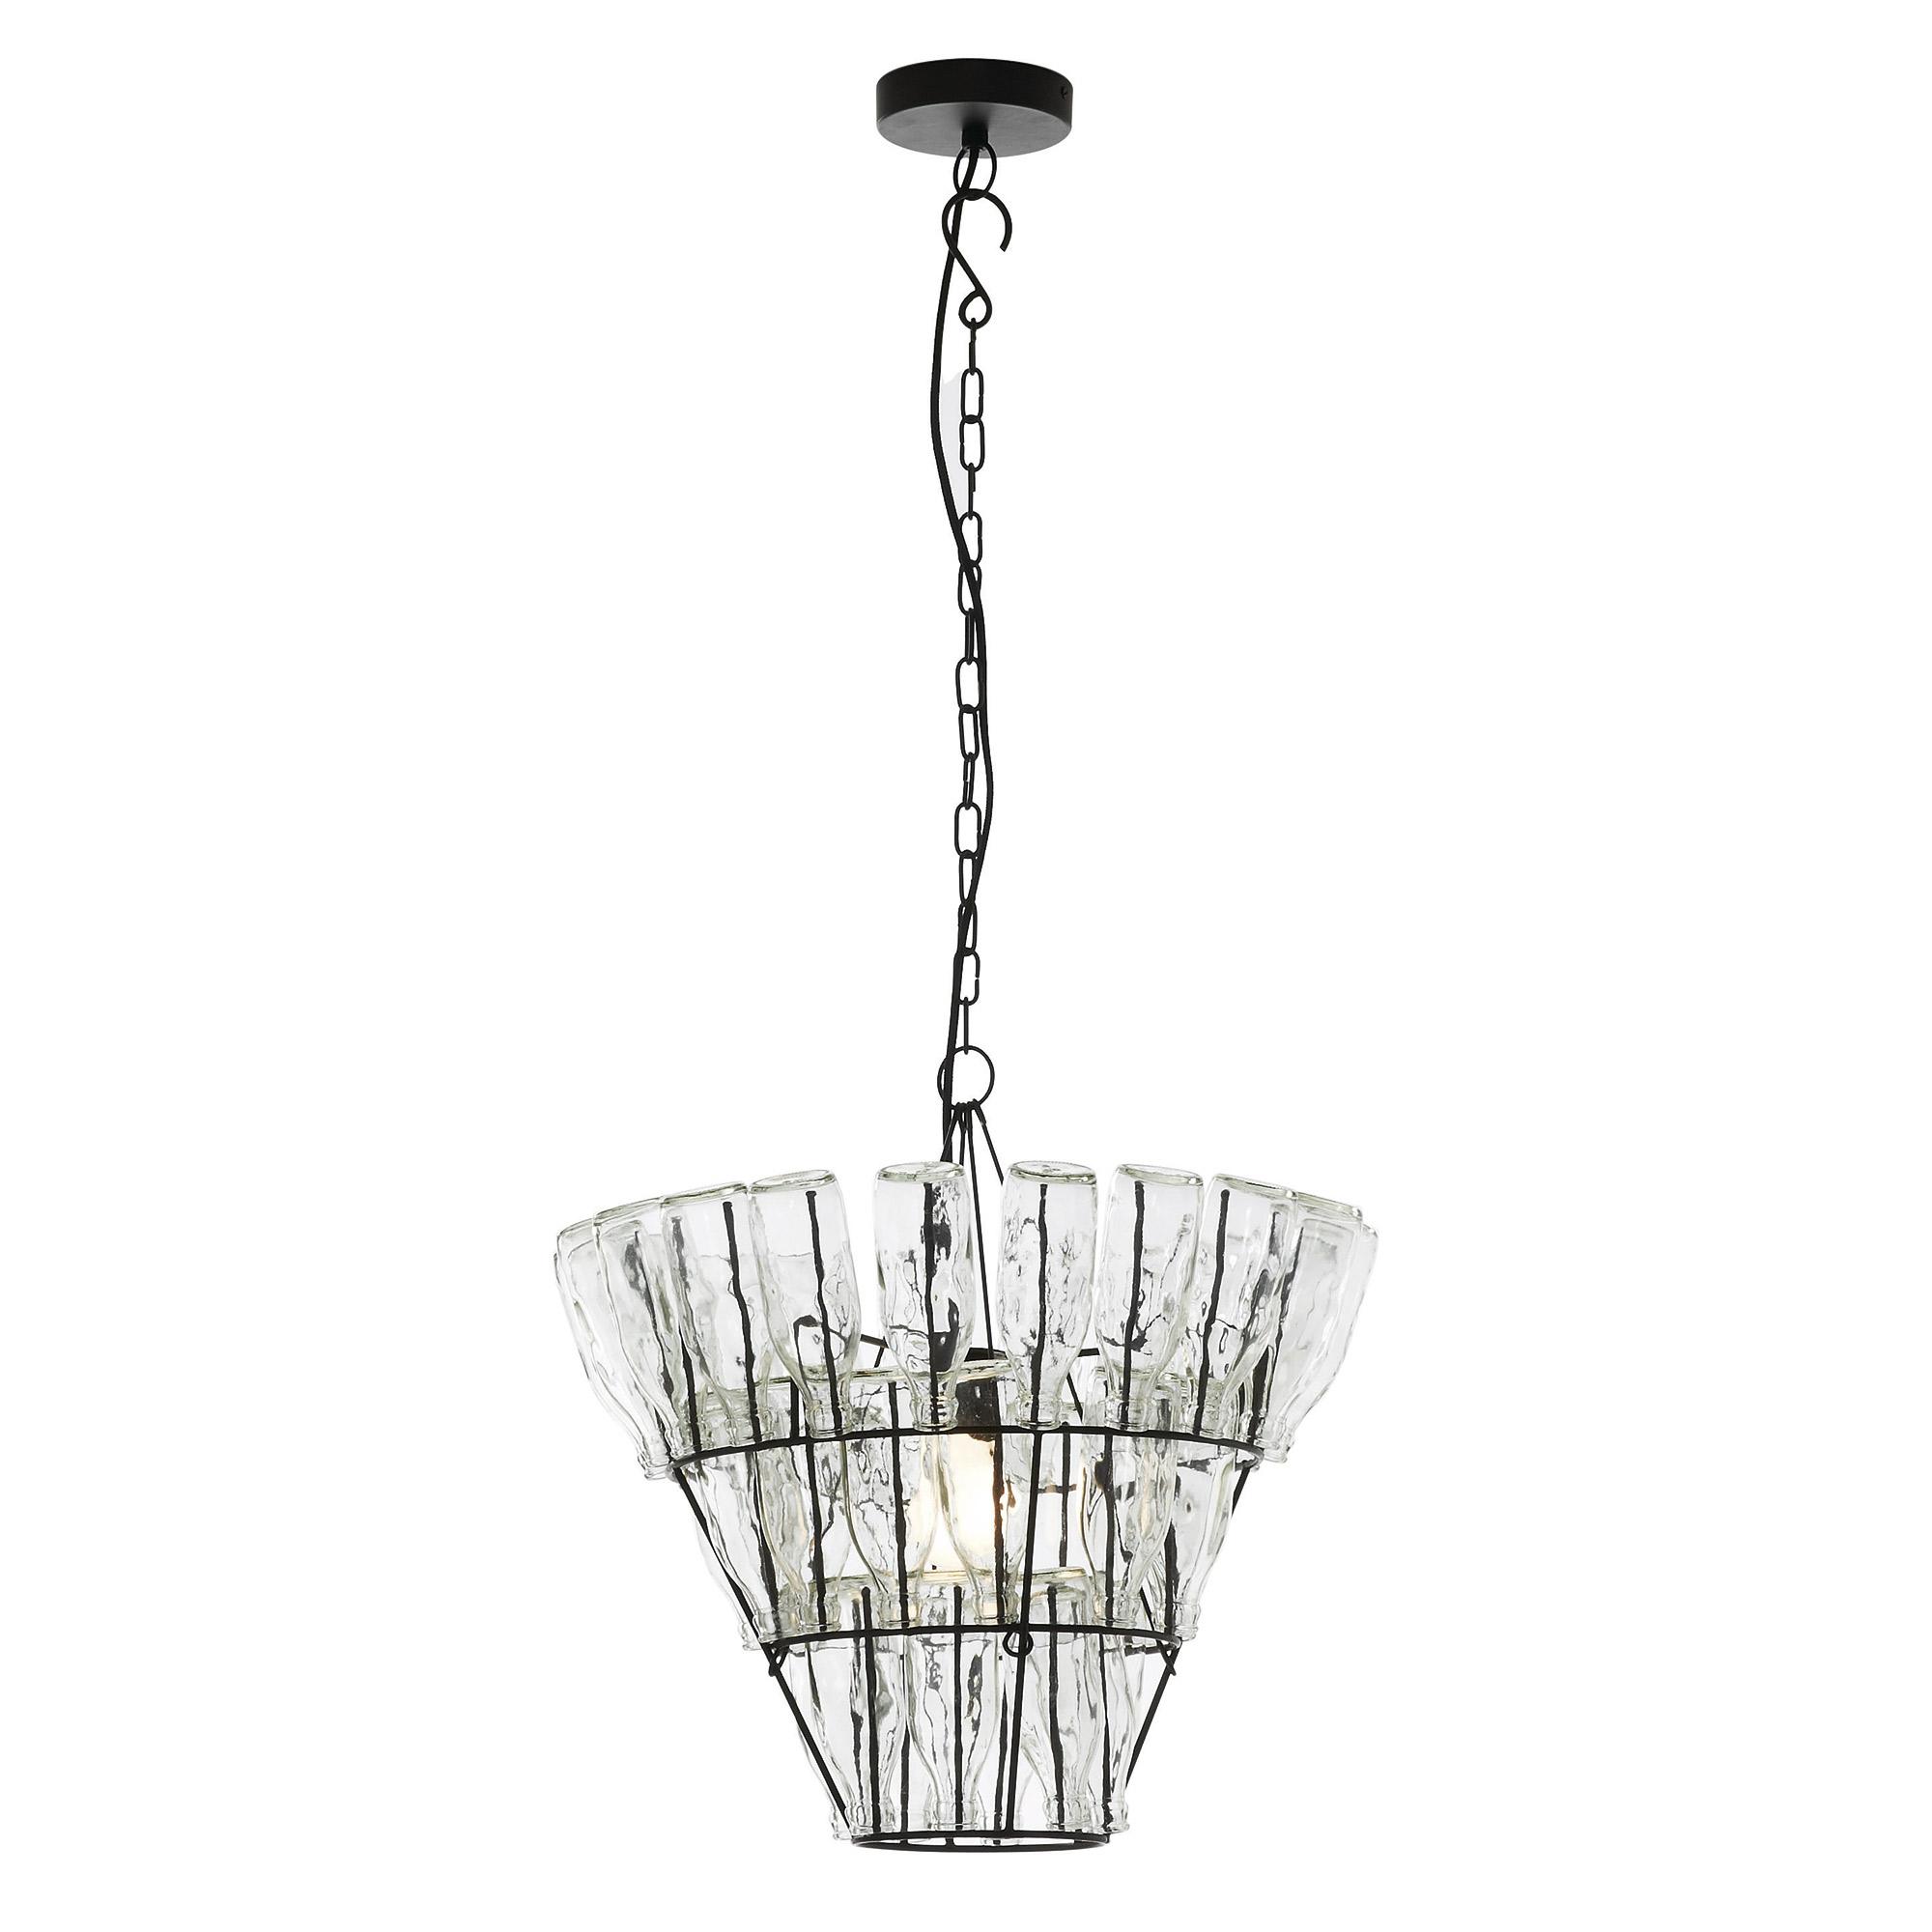 Kave Home Hanglamp 'Bliss'